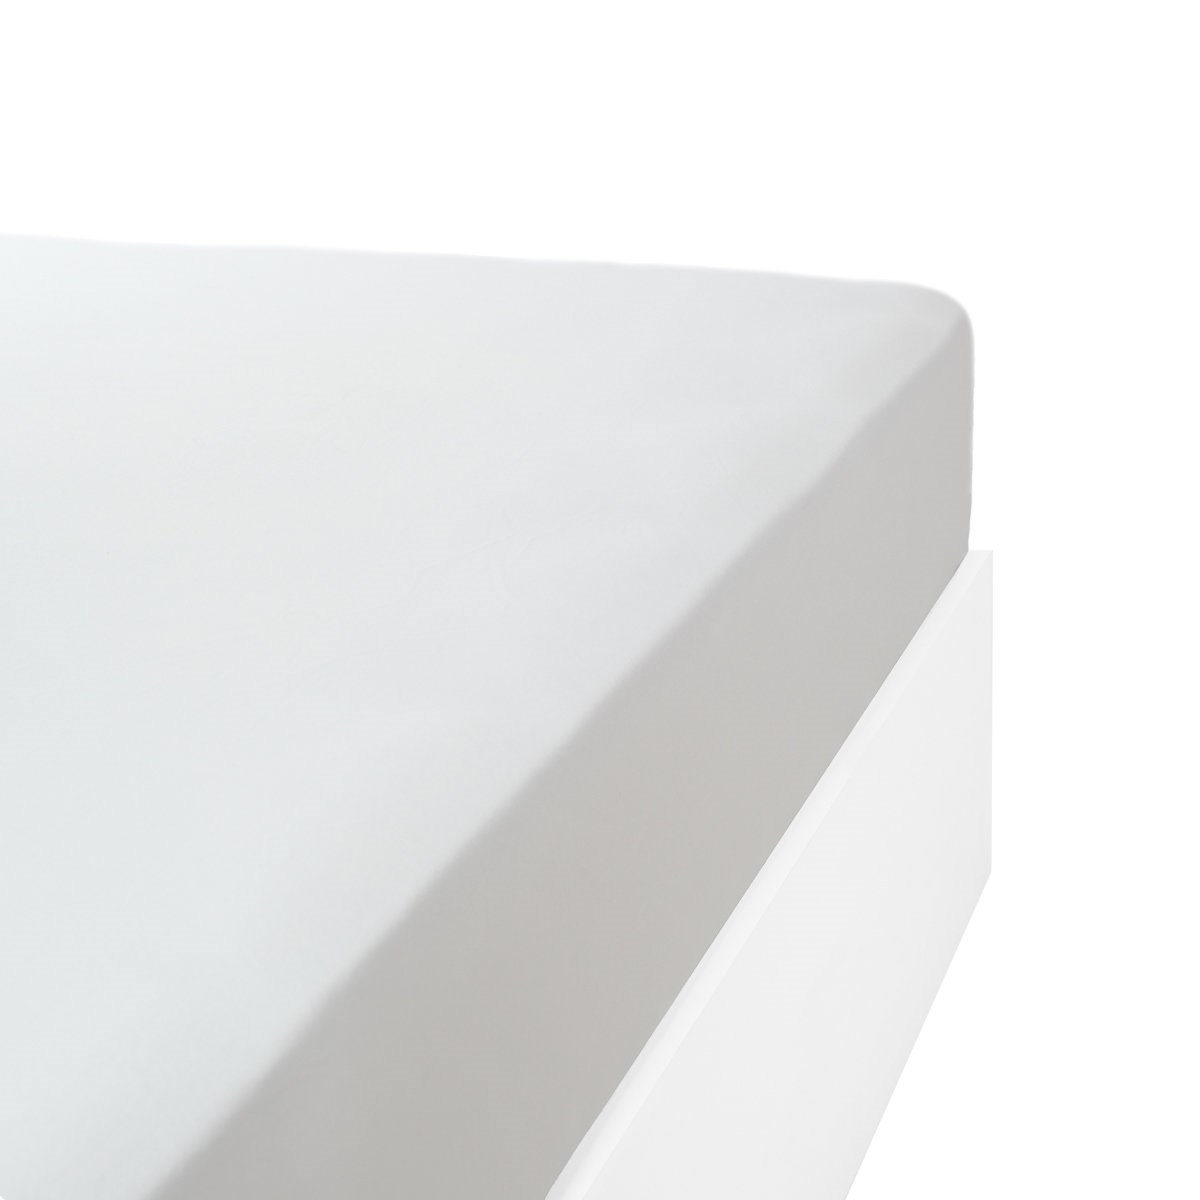 Drap housse jersey extensible en coton blanc 140x200 cm